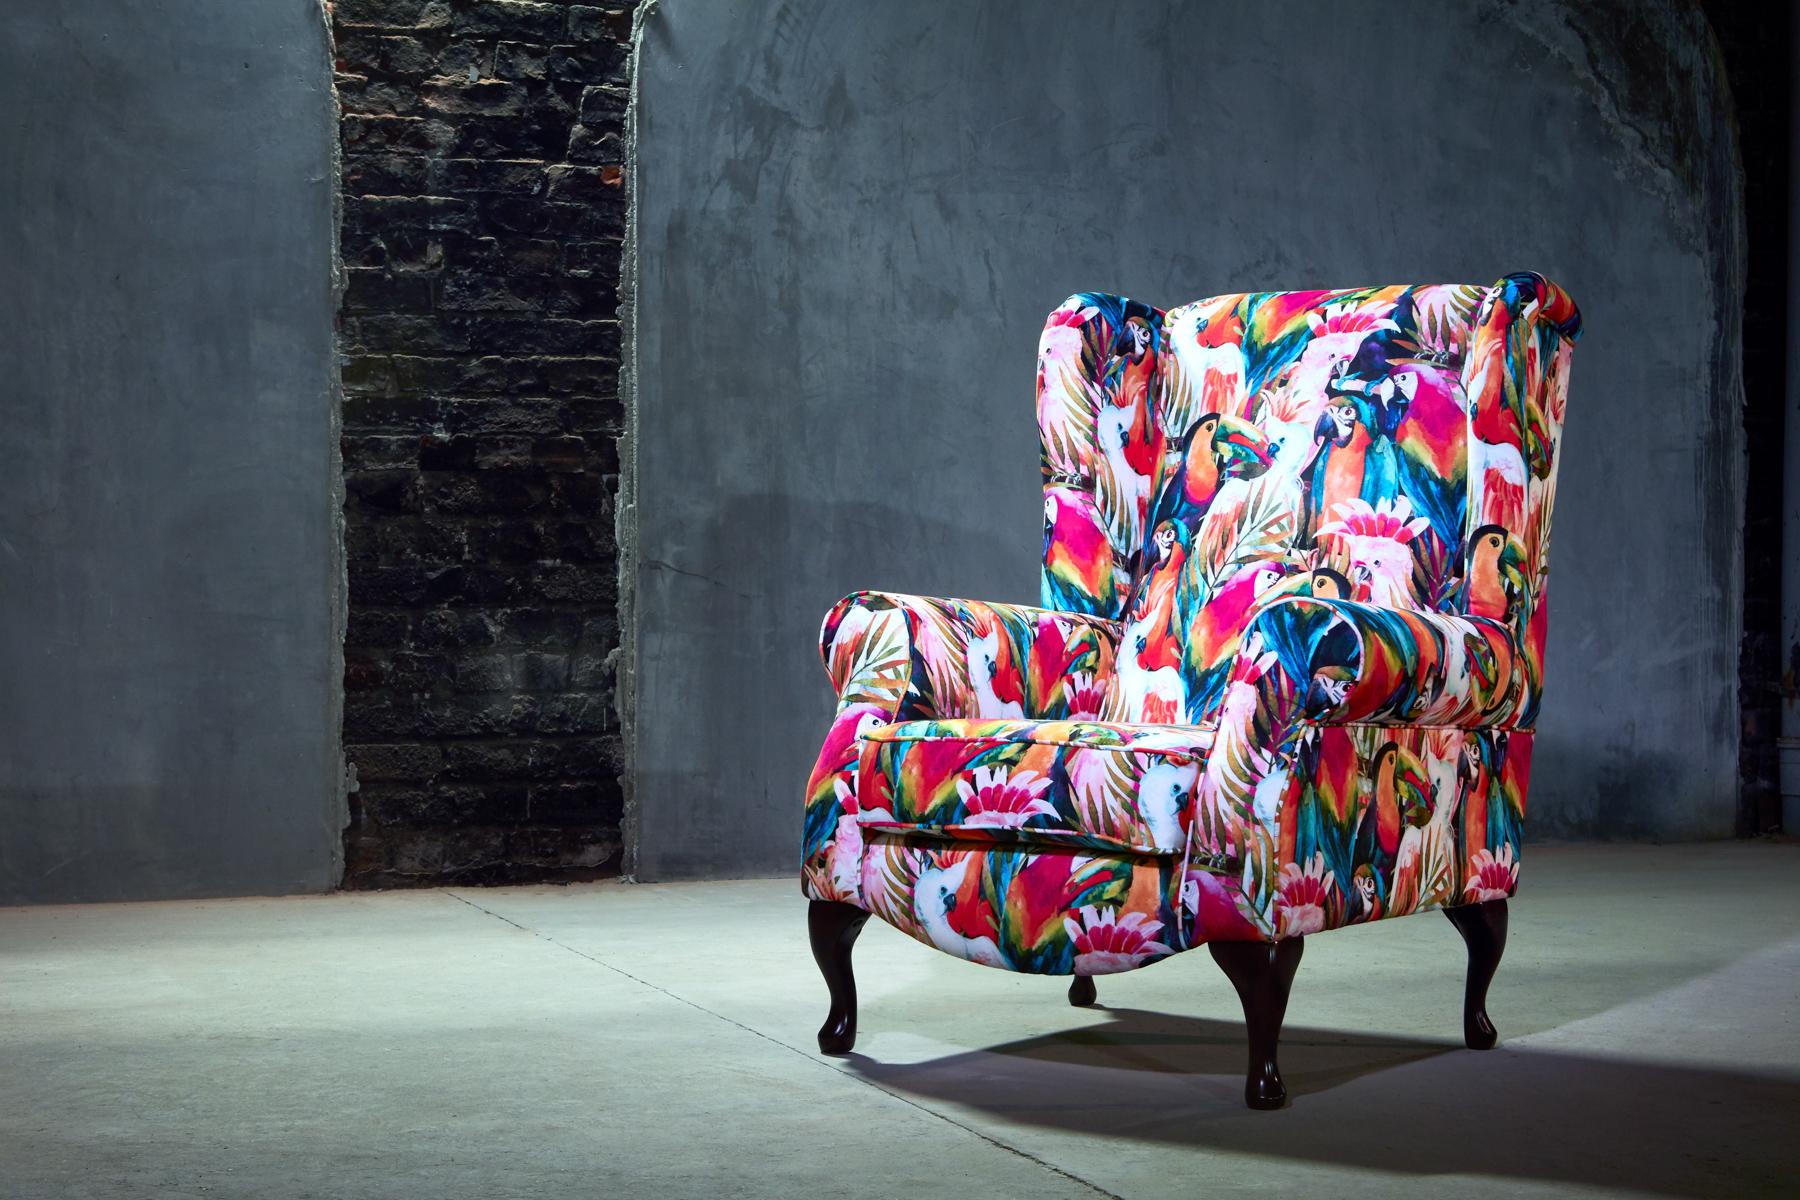 Mad chair00204 - Copy - Copy (2) - Copy - Copy.jpg